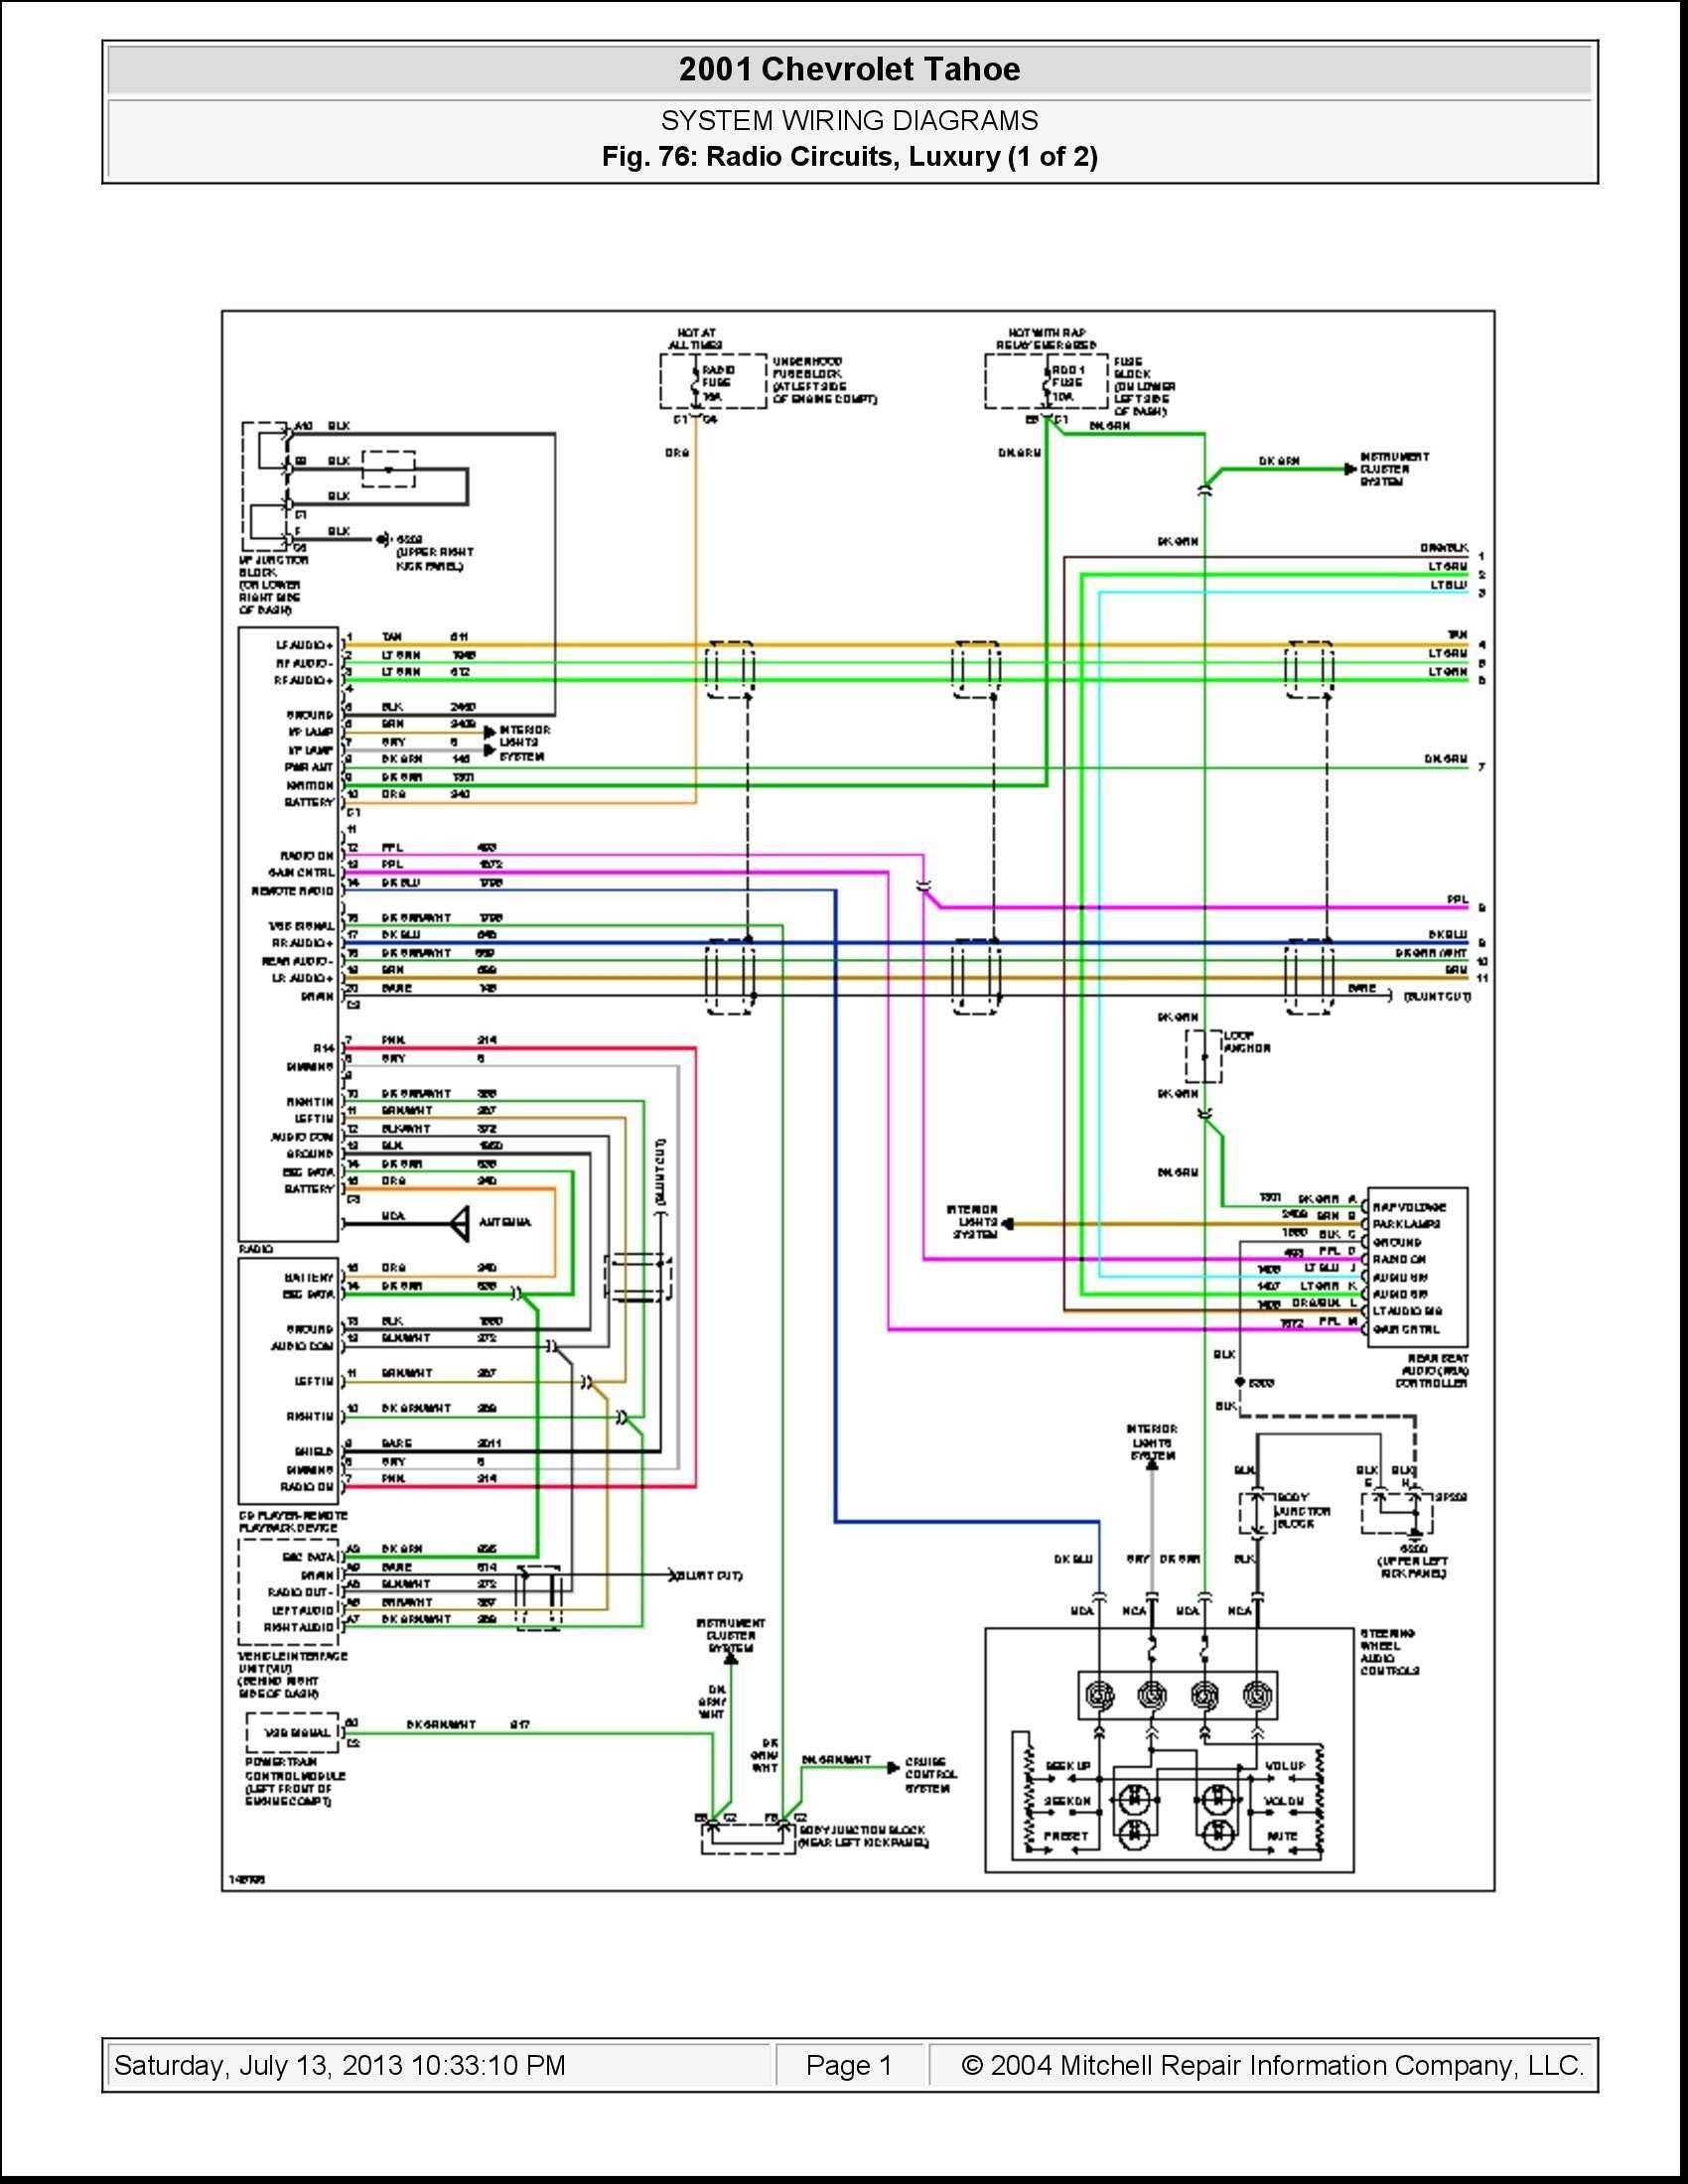 2005 chevy silverado wiring diagram radio sy 1290  2005 chevy silverado wiring diagram awesome 2005 chevy  2005 chevy silverado wiring diagram